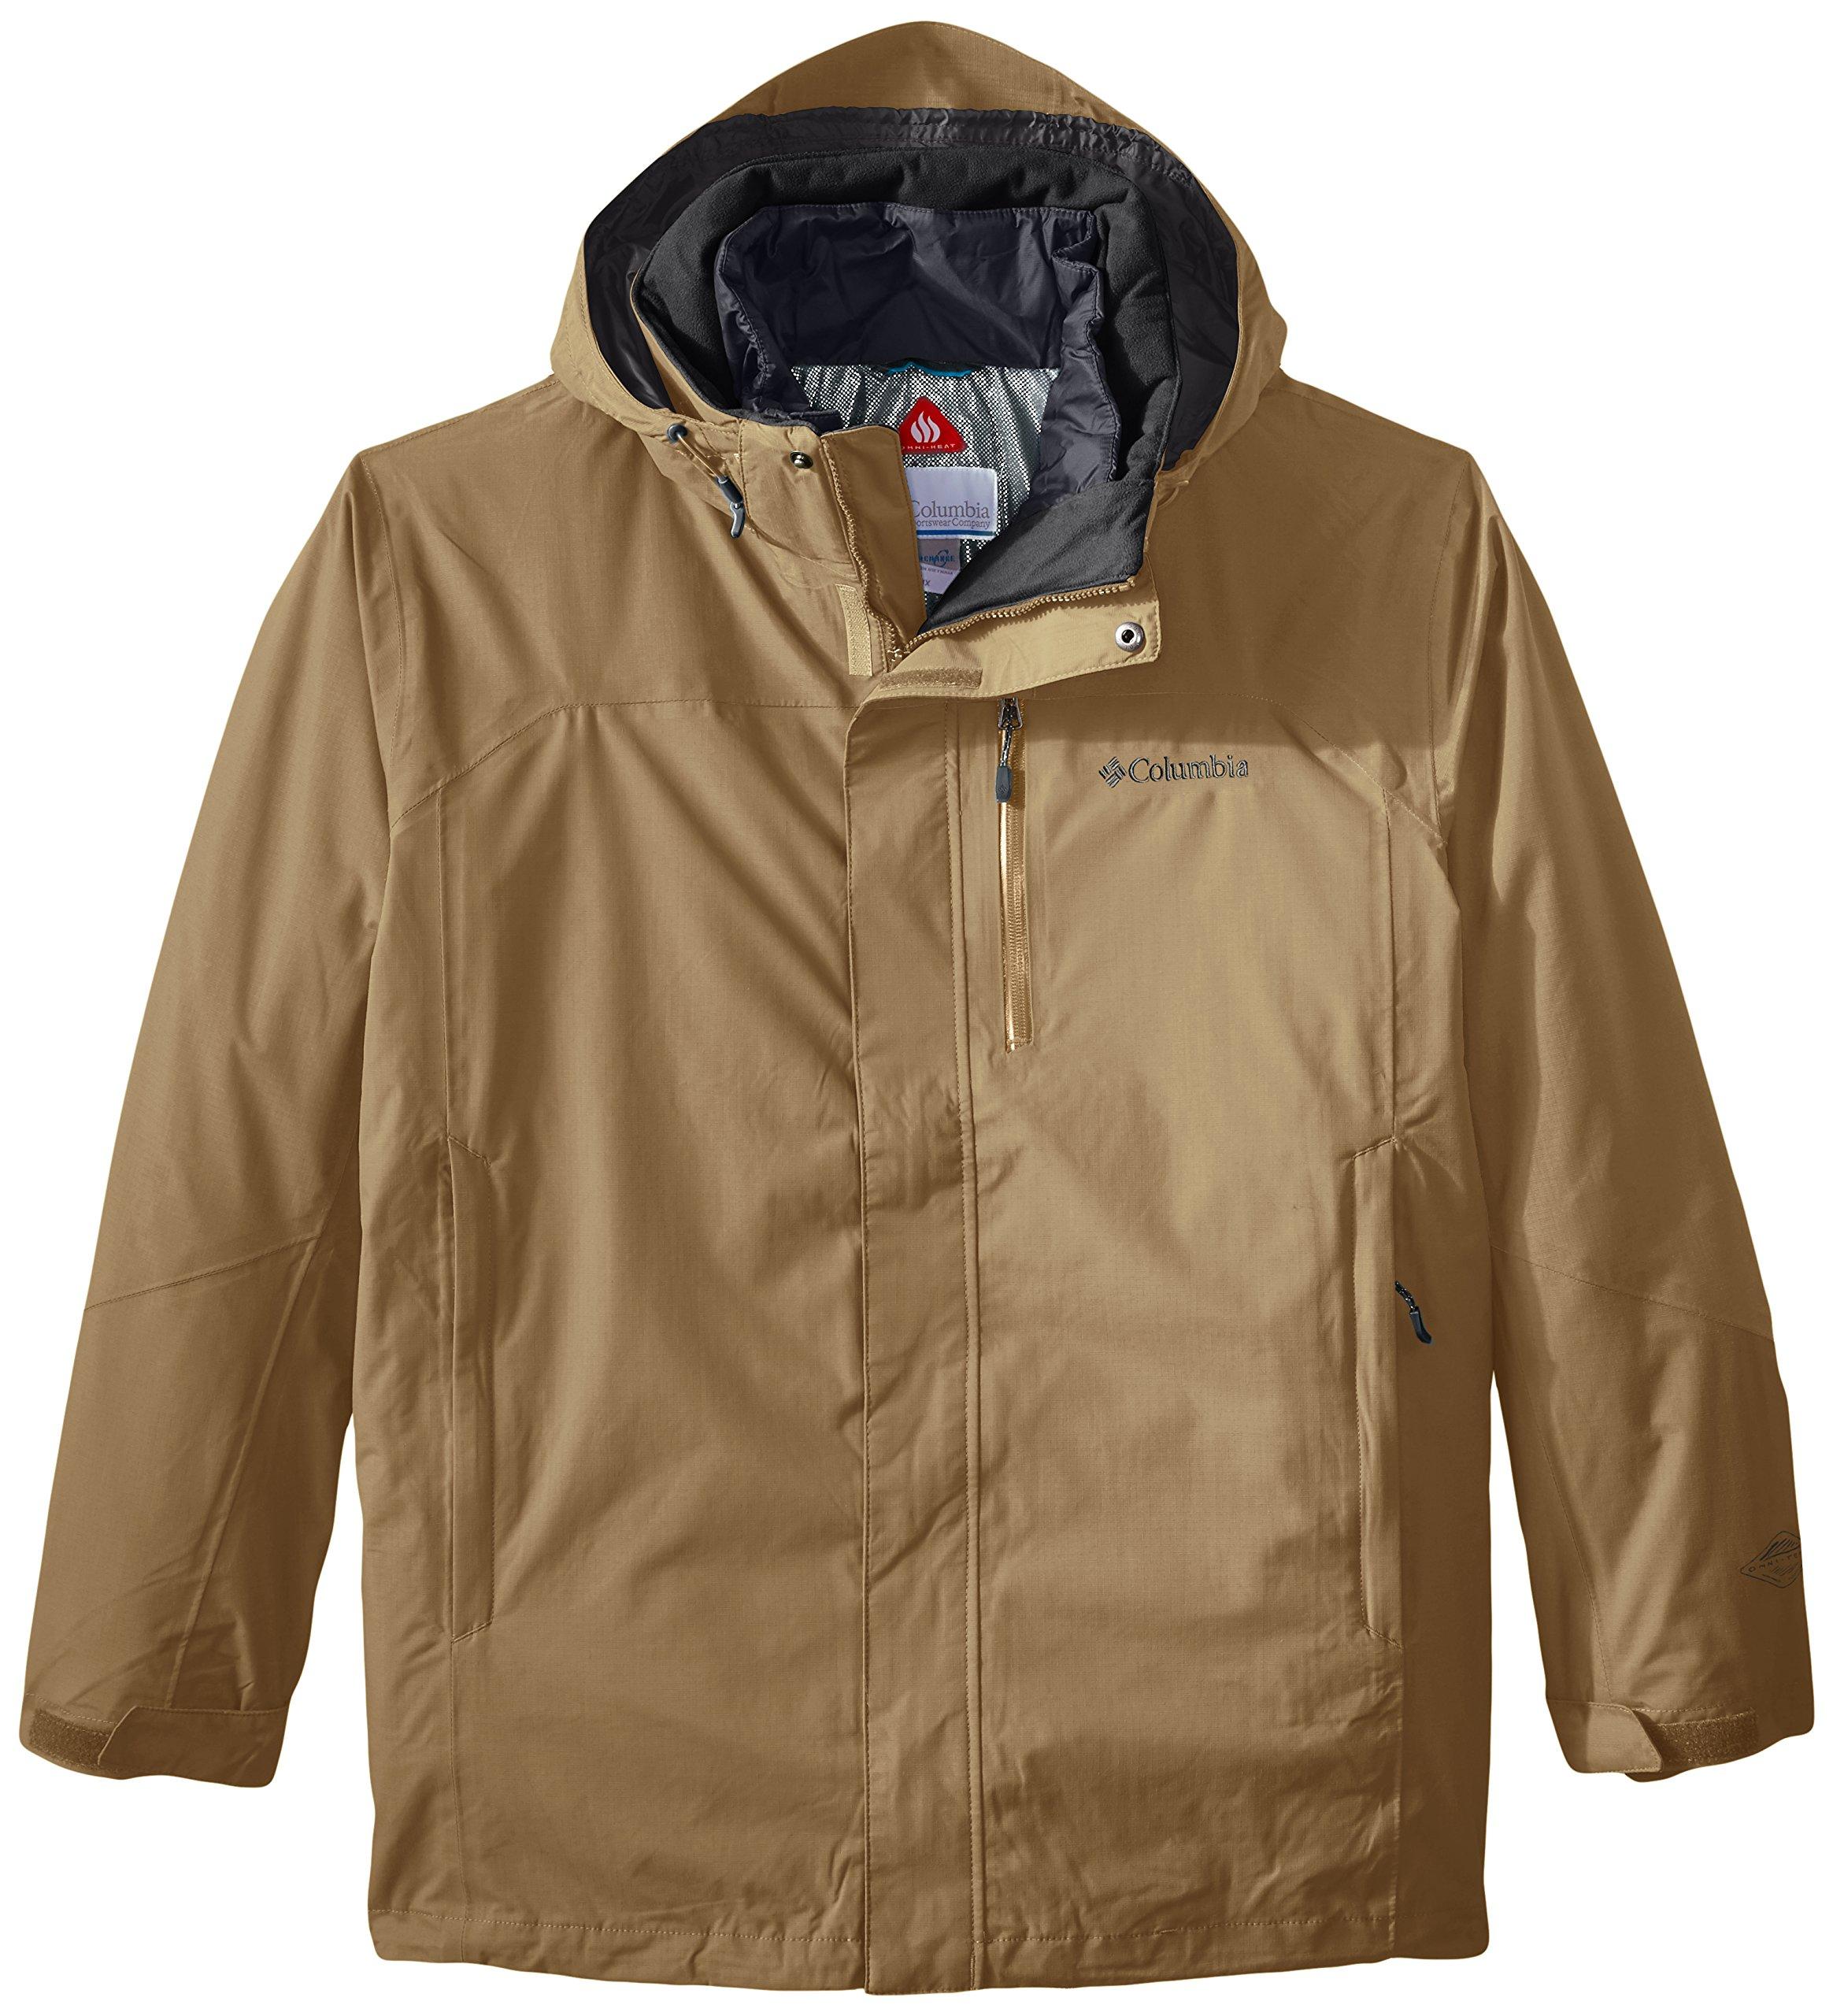 Columbia Men's Lhotse II Interchange Jacket, Delta, XX-Large